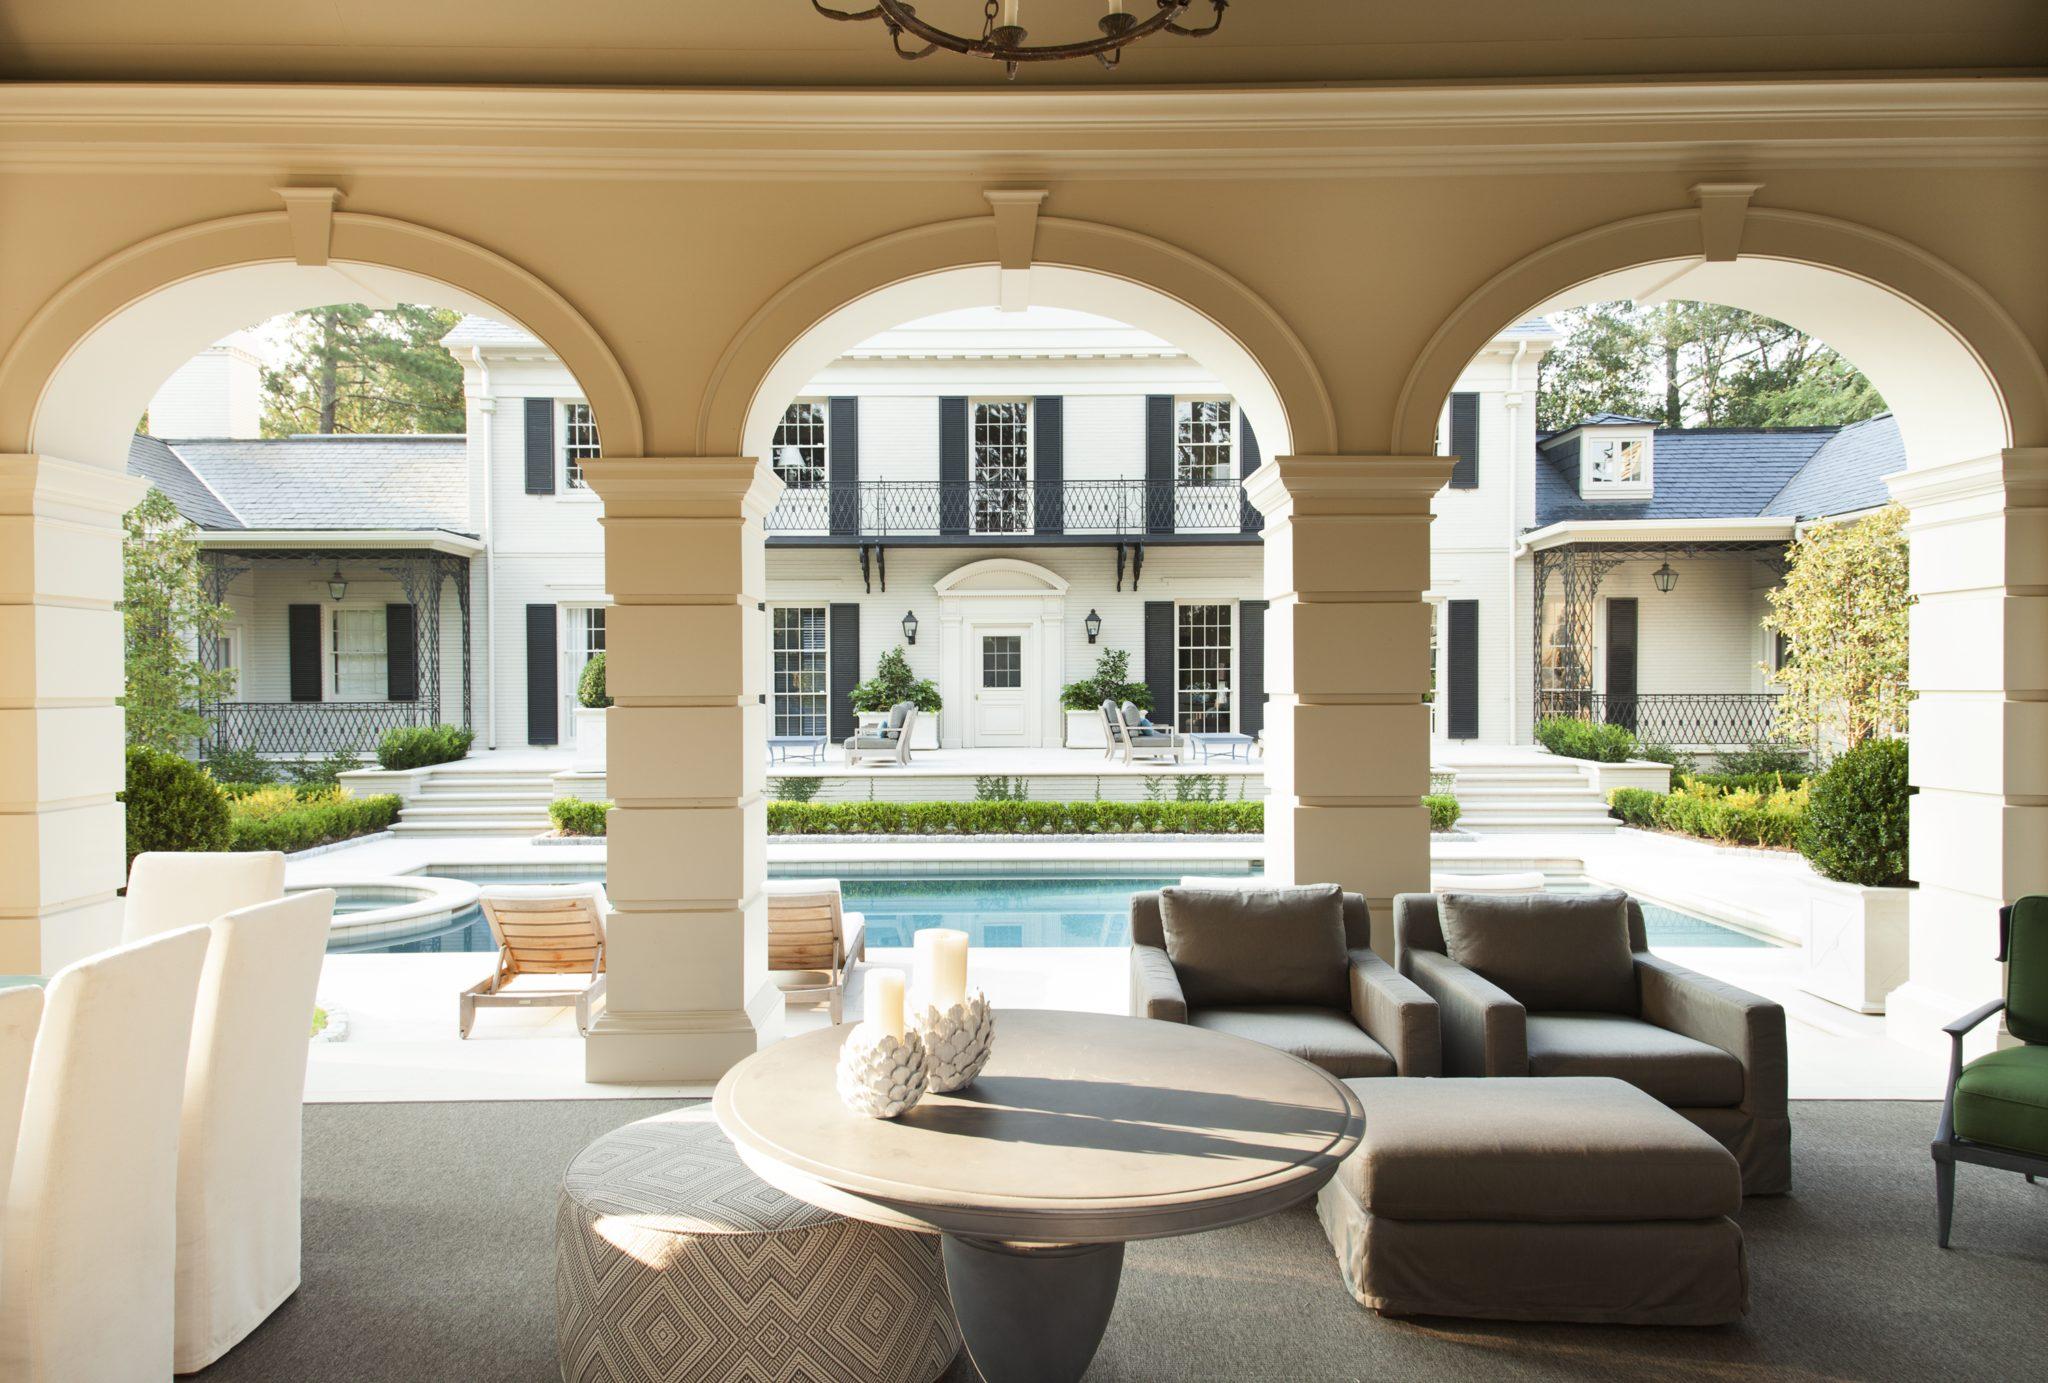 Cabana, pool andgarden by Howard Design Studio